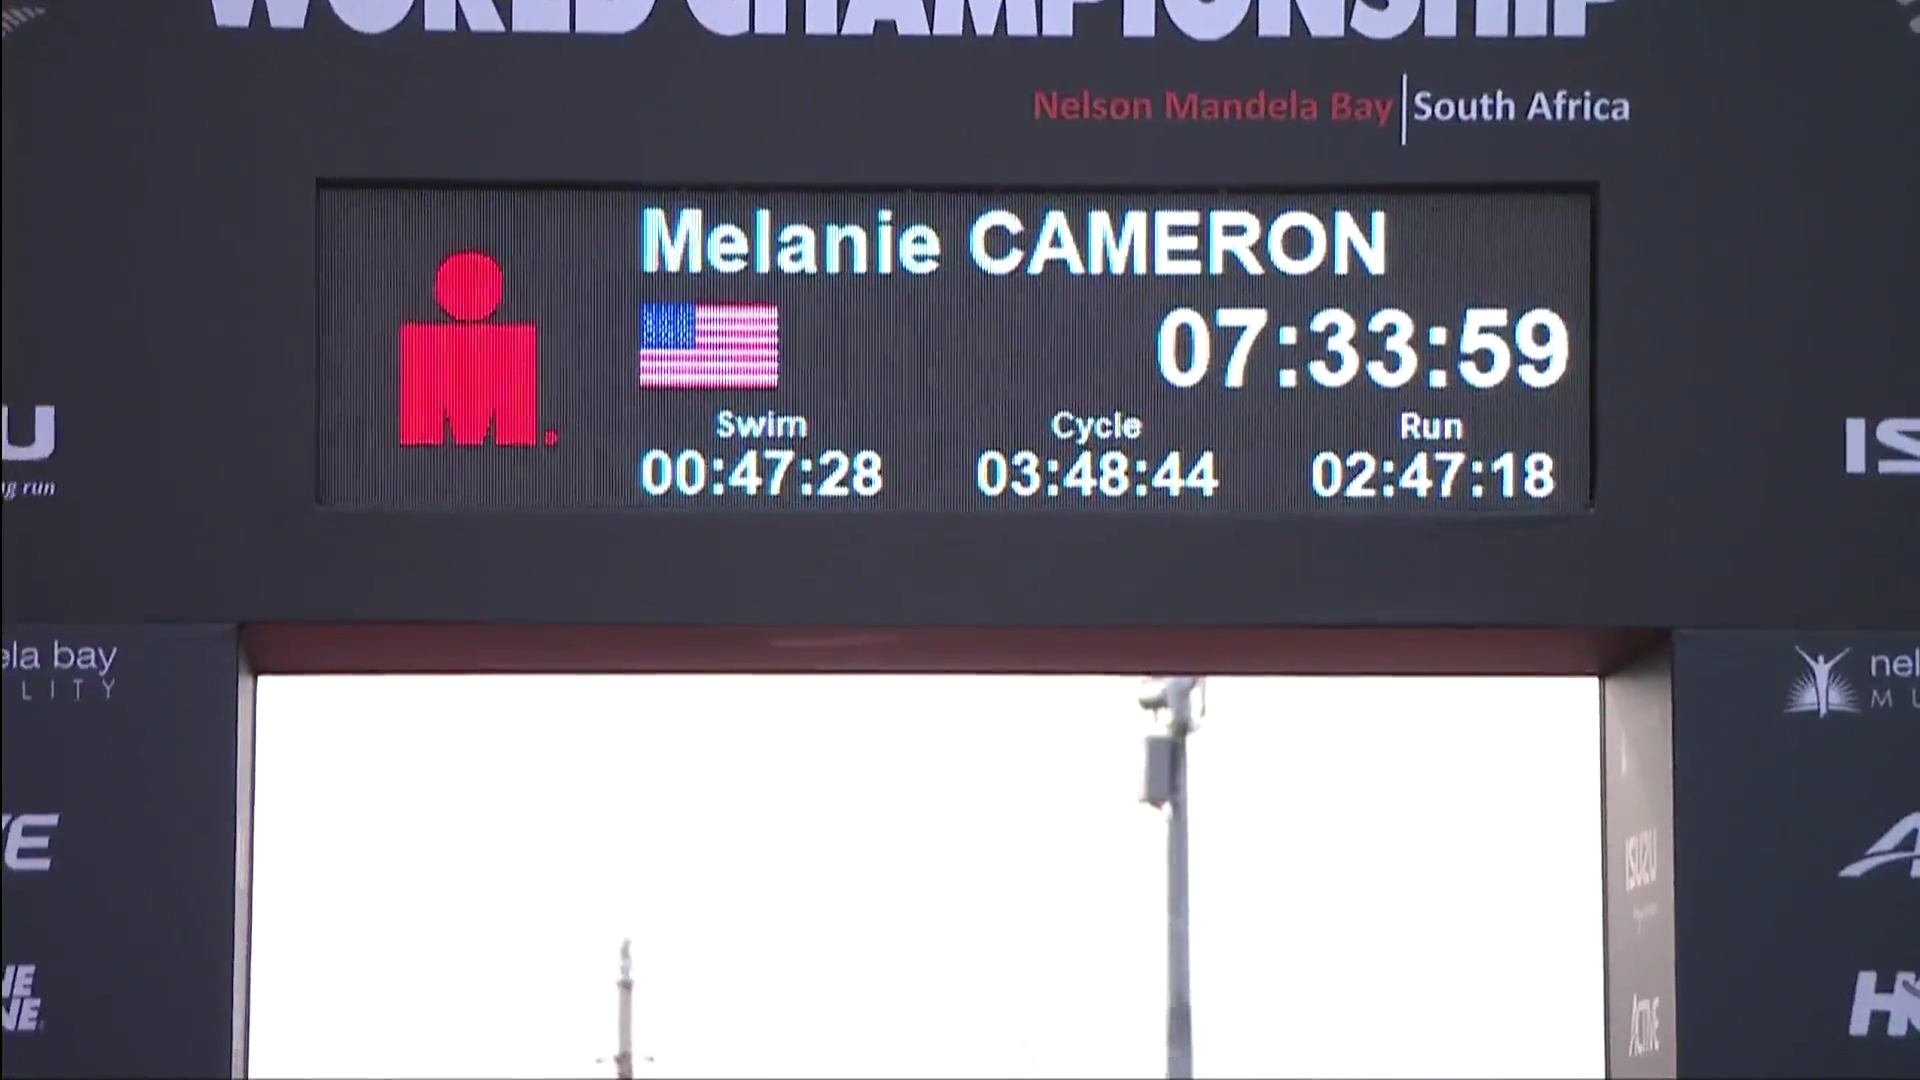 Melanie Cameron – Ironman World Championship 2018 16